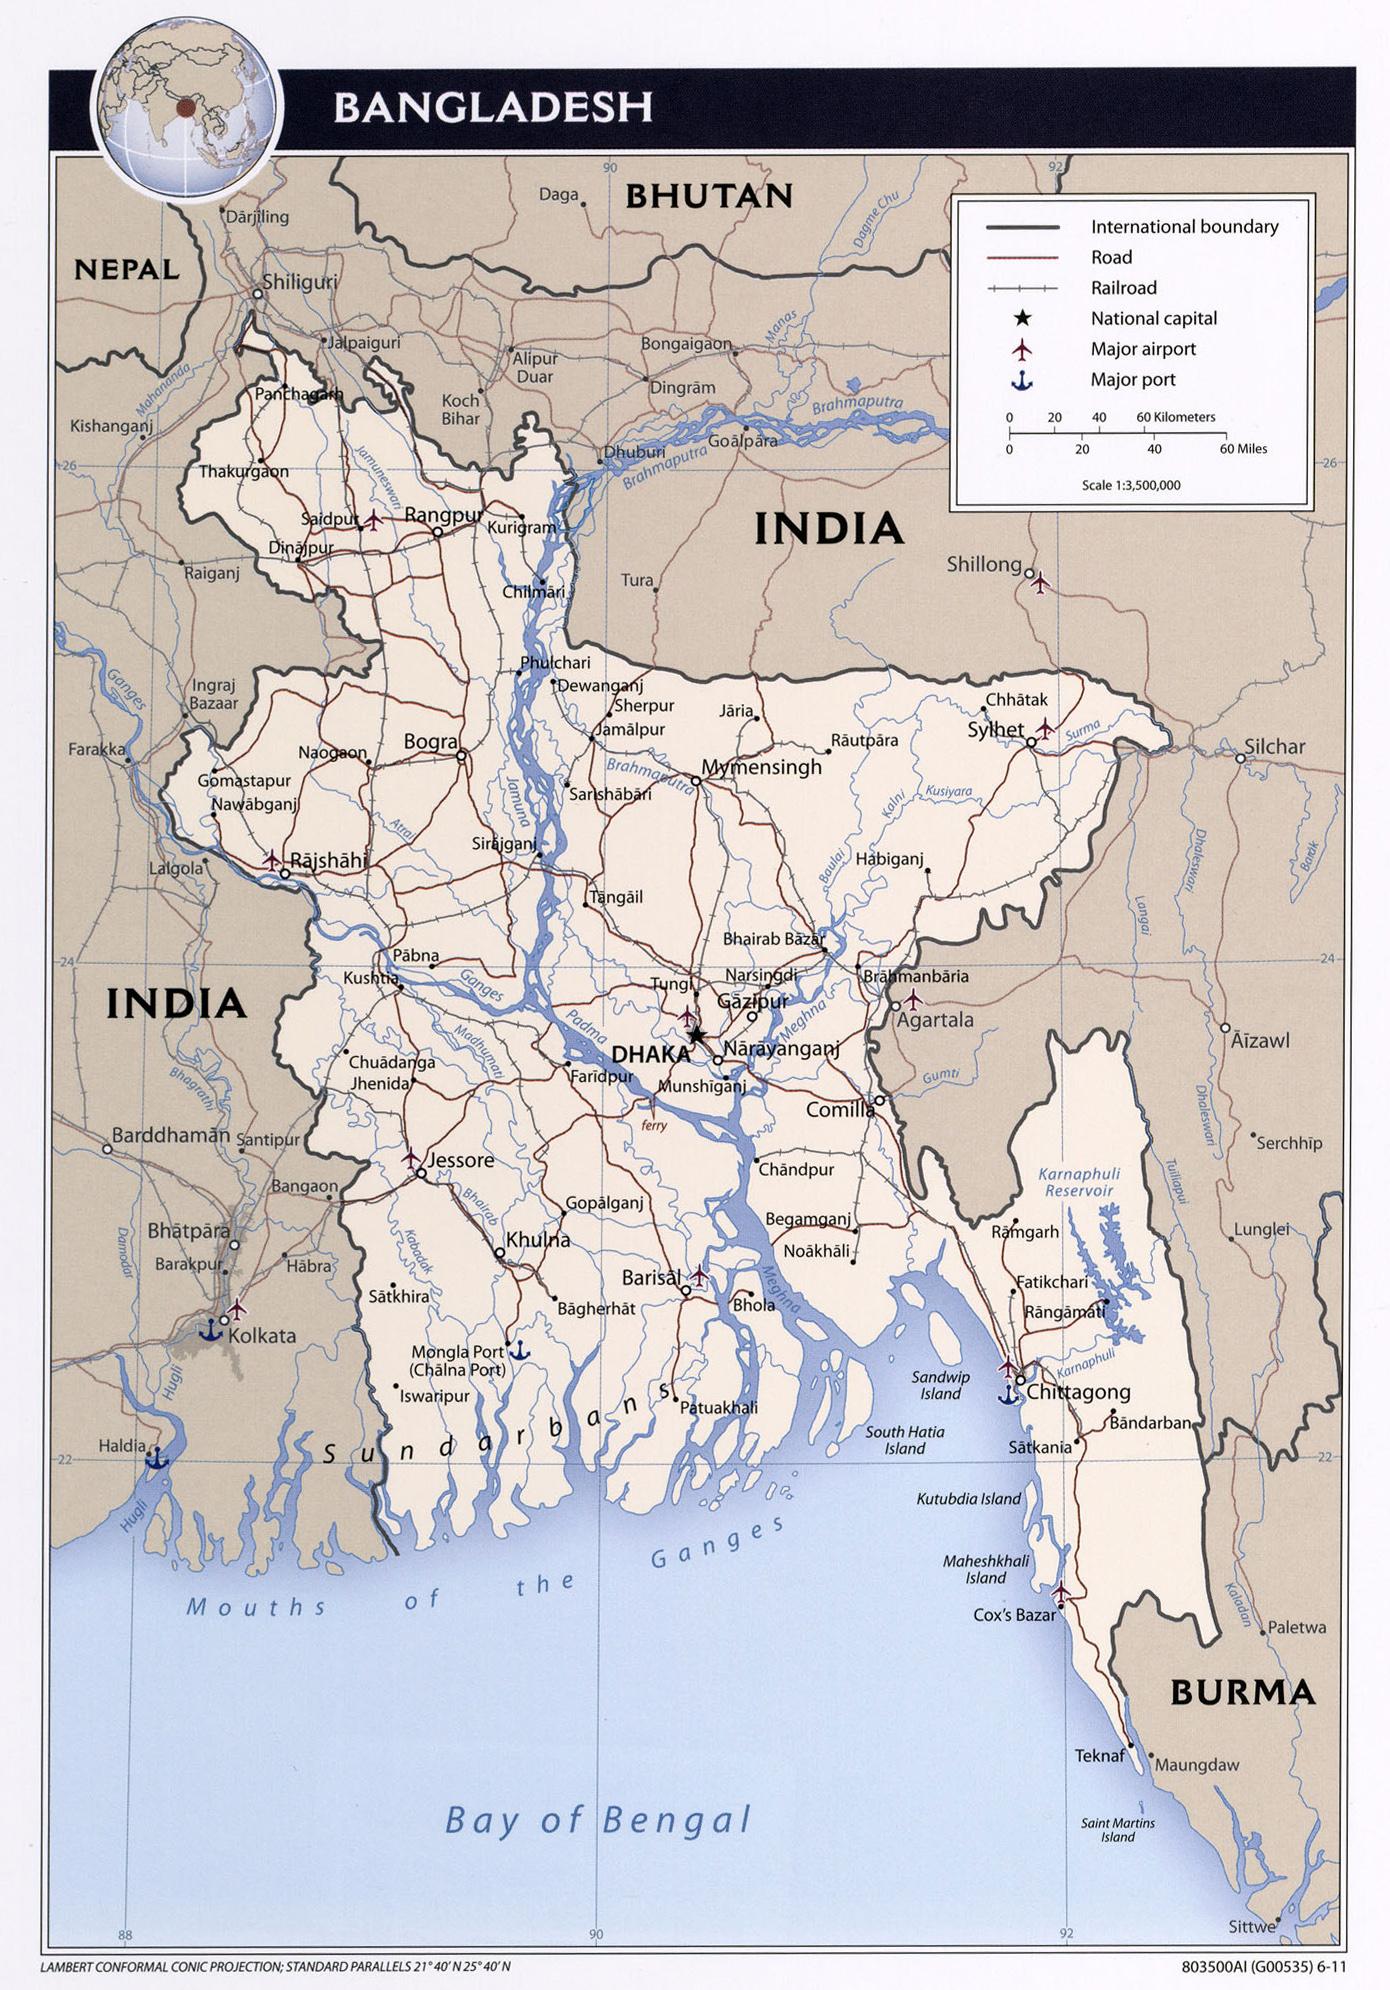 Maps of Bangladesh | Detailed map of Bangladesh in English | Tourist ...